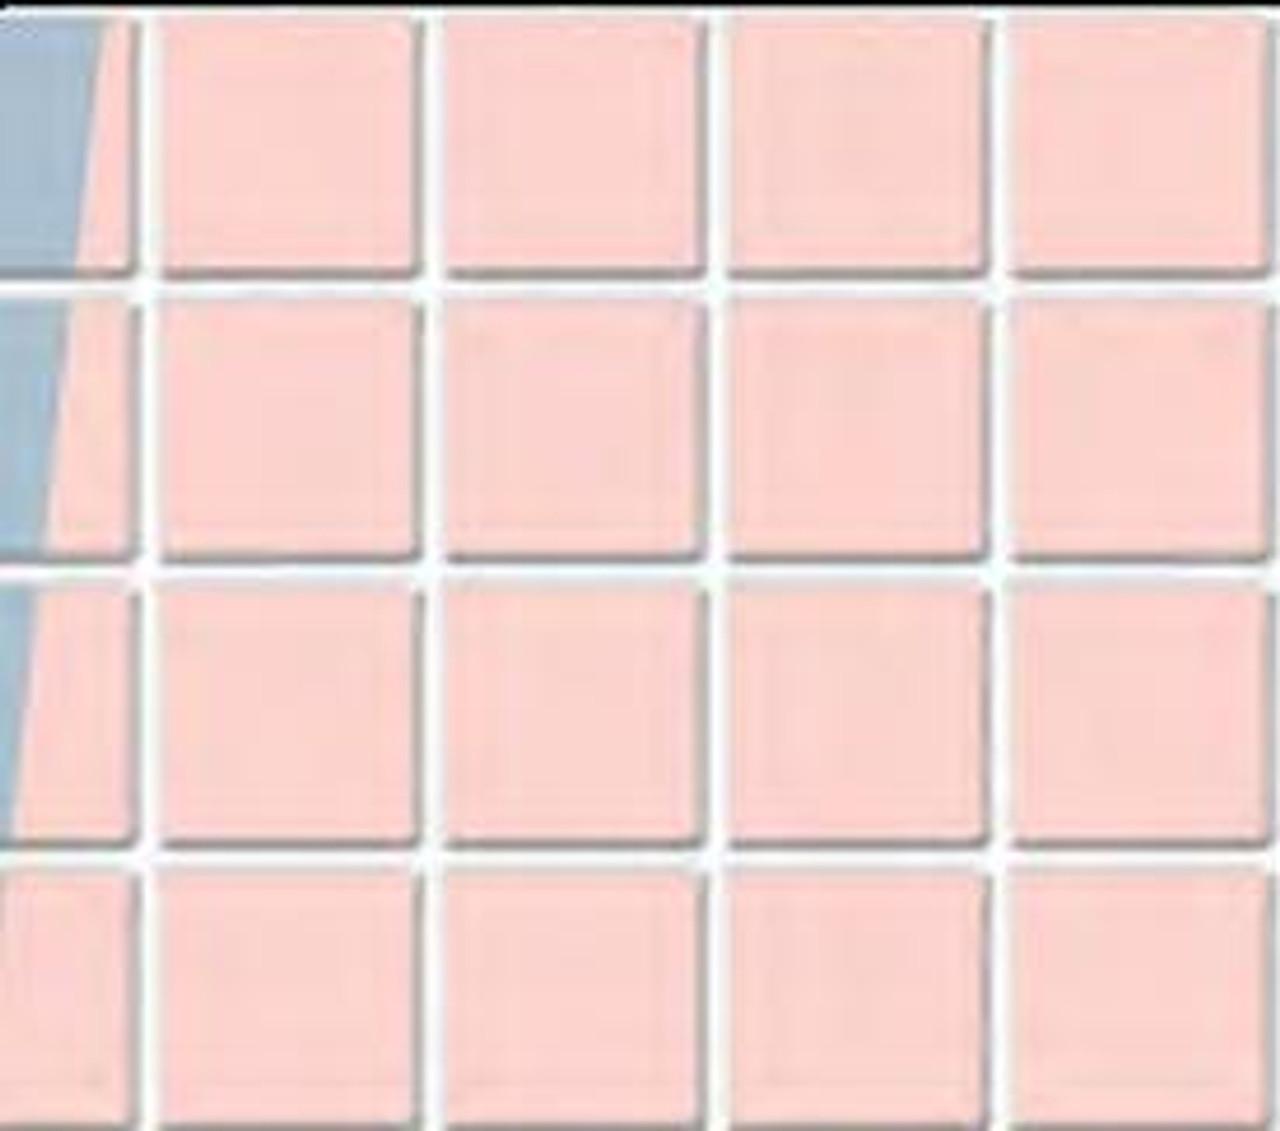 Tile Sheet - Pink Square